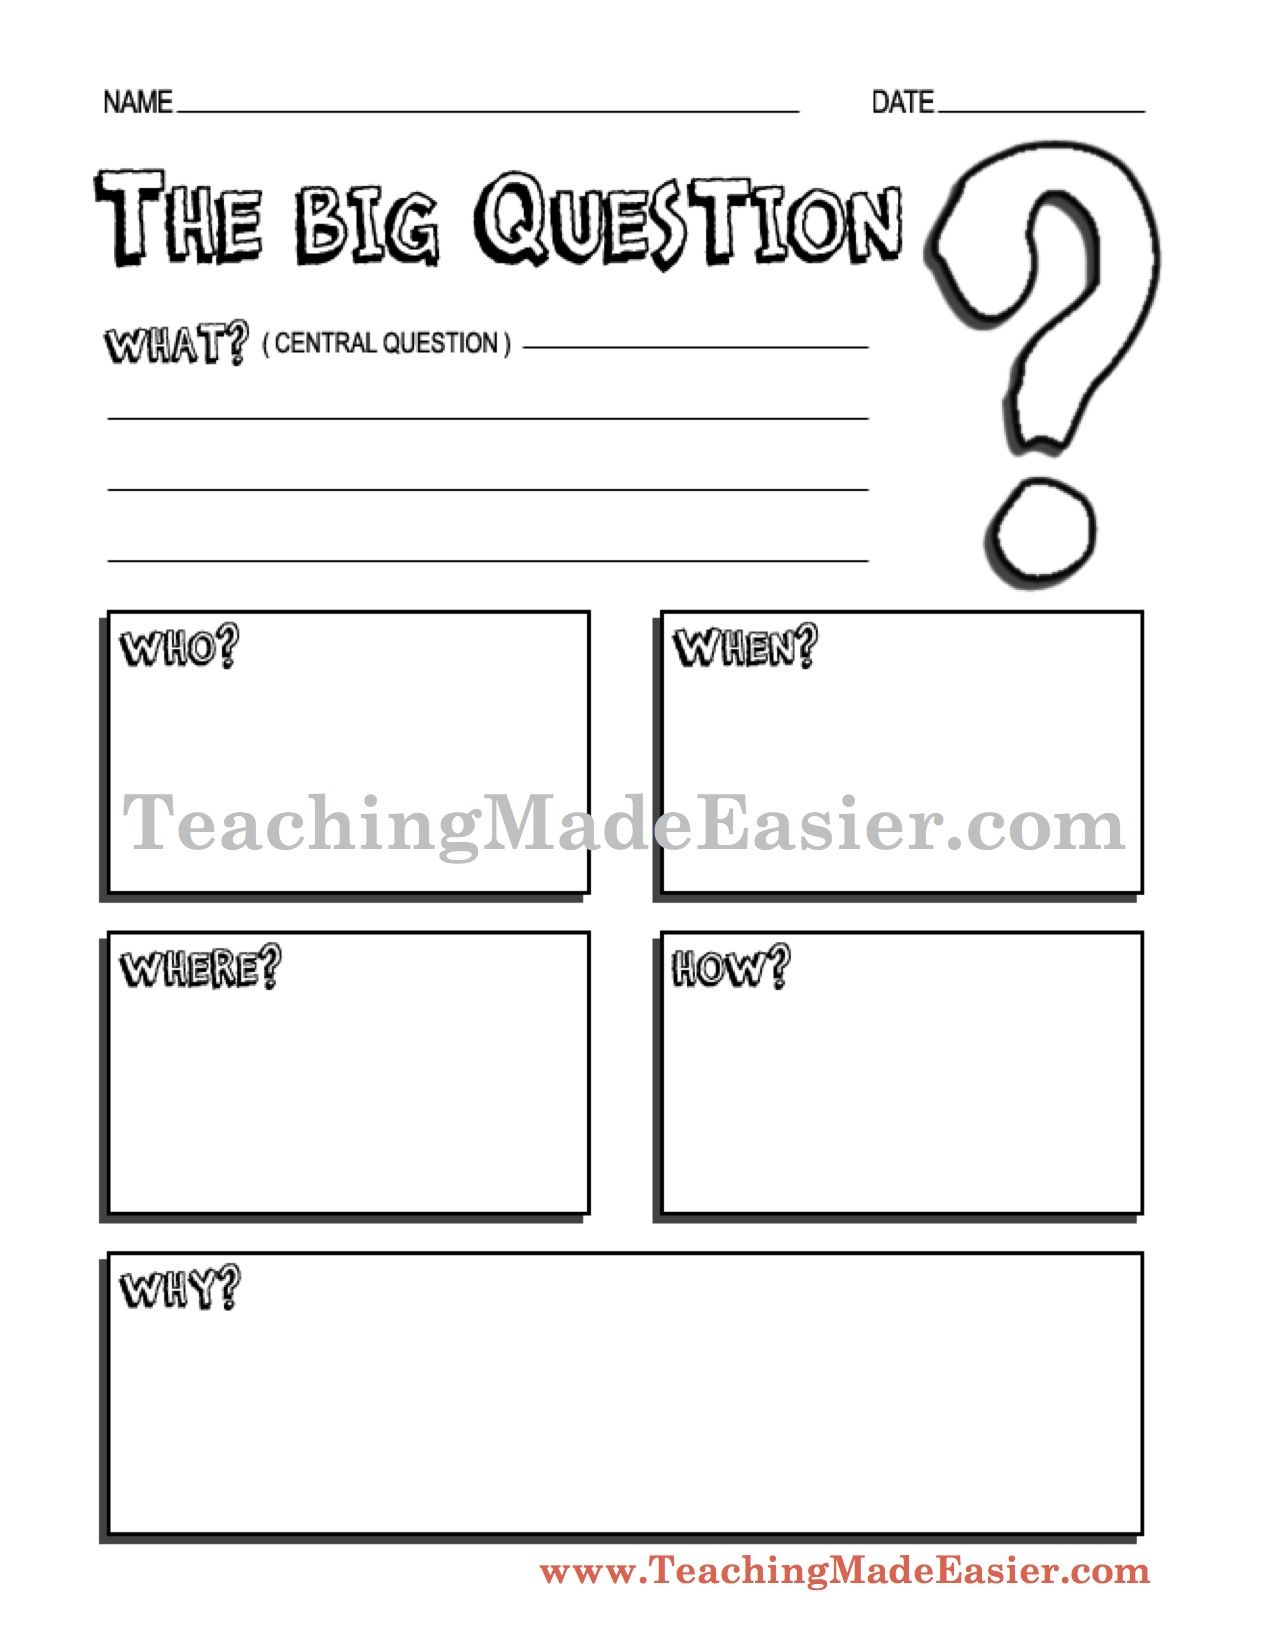 Teachingmadeeasier Masters Step 1 Click Graphic